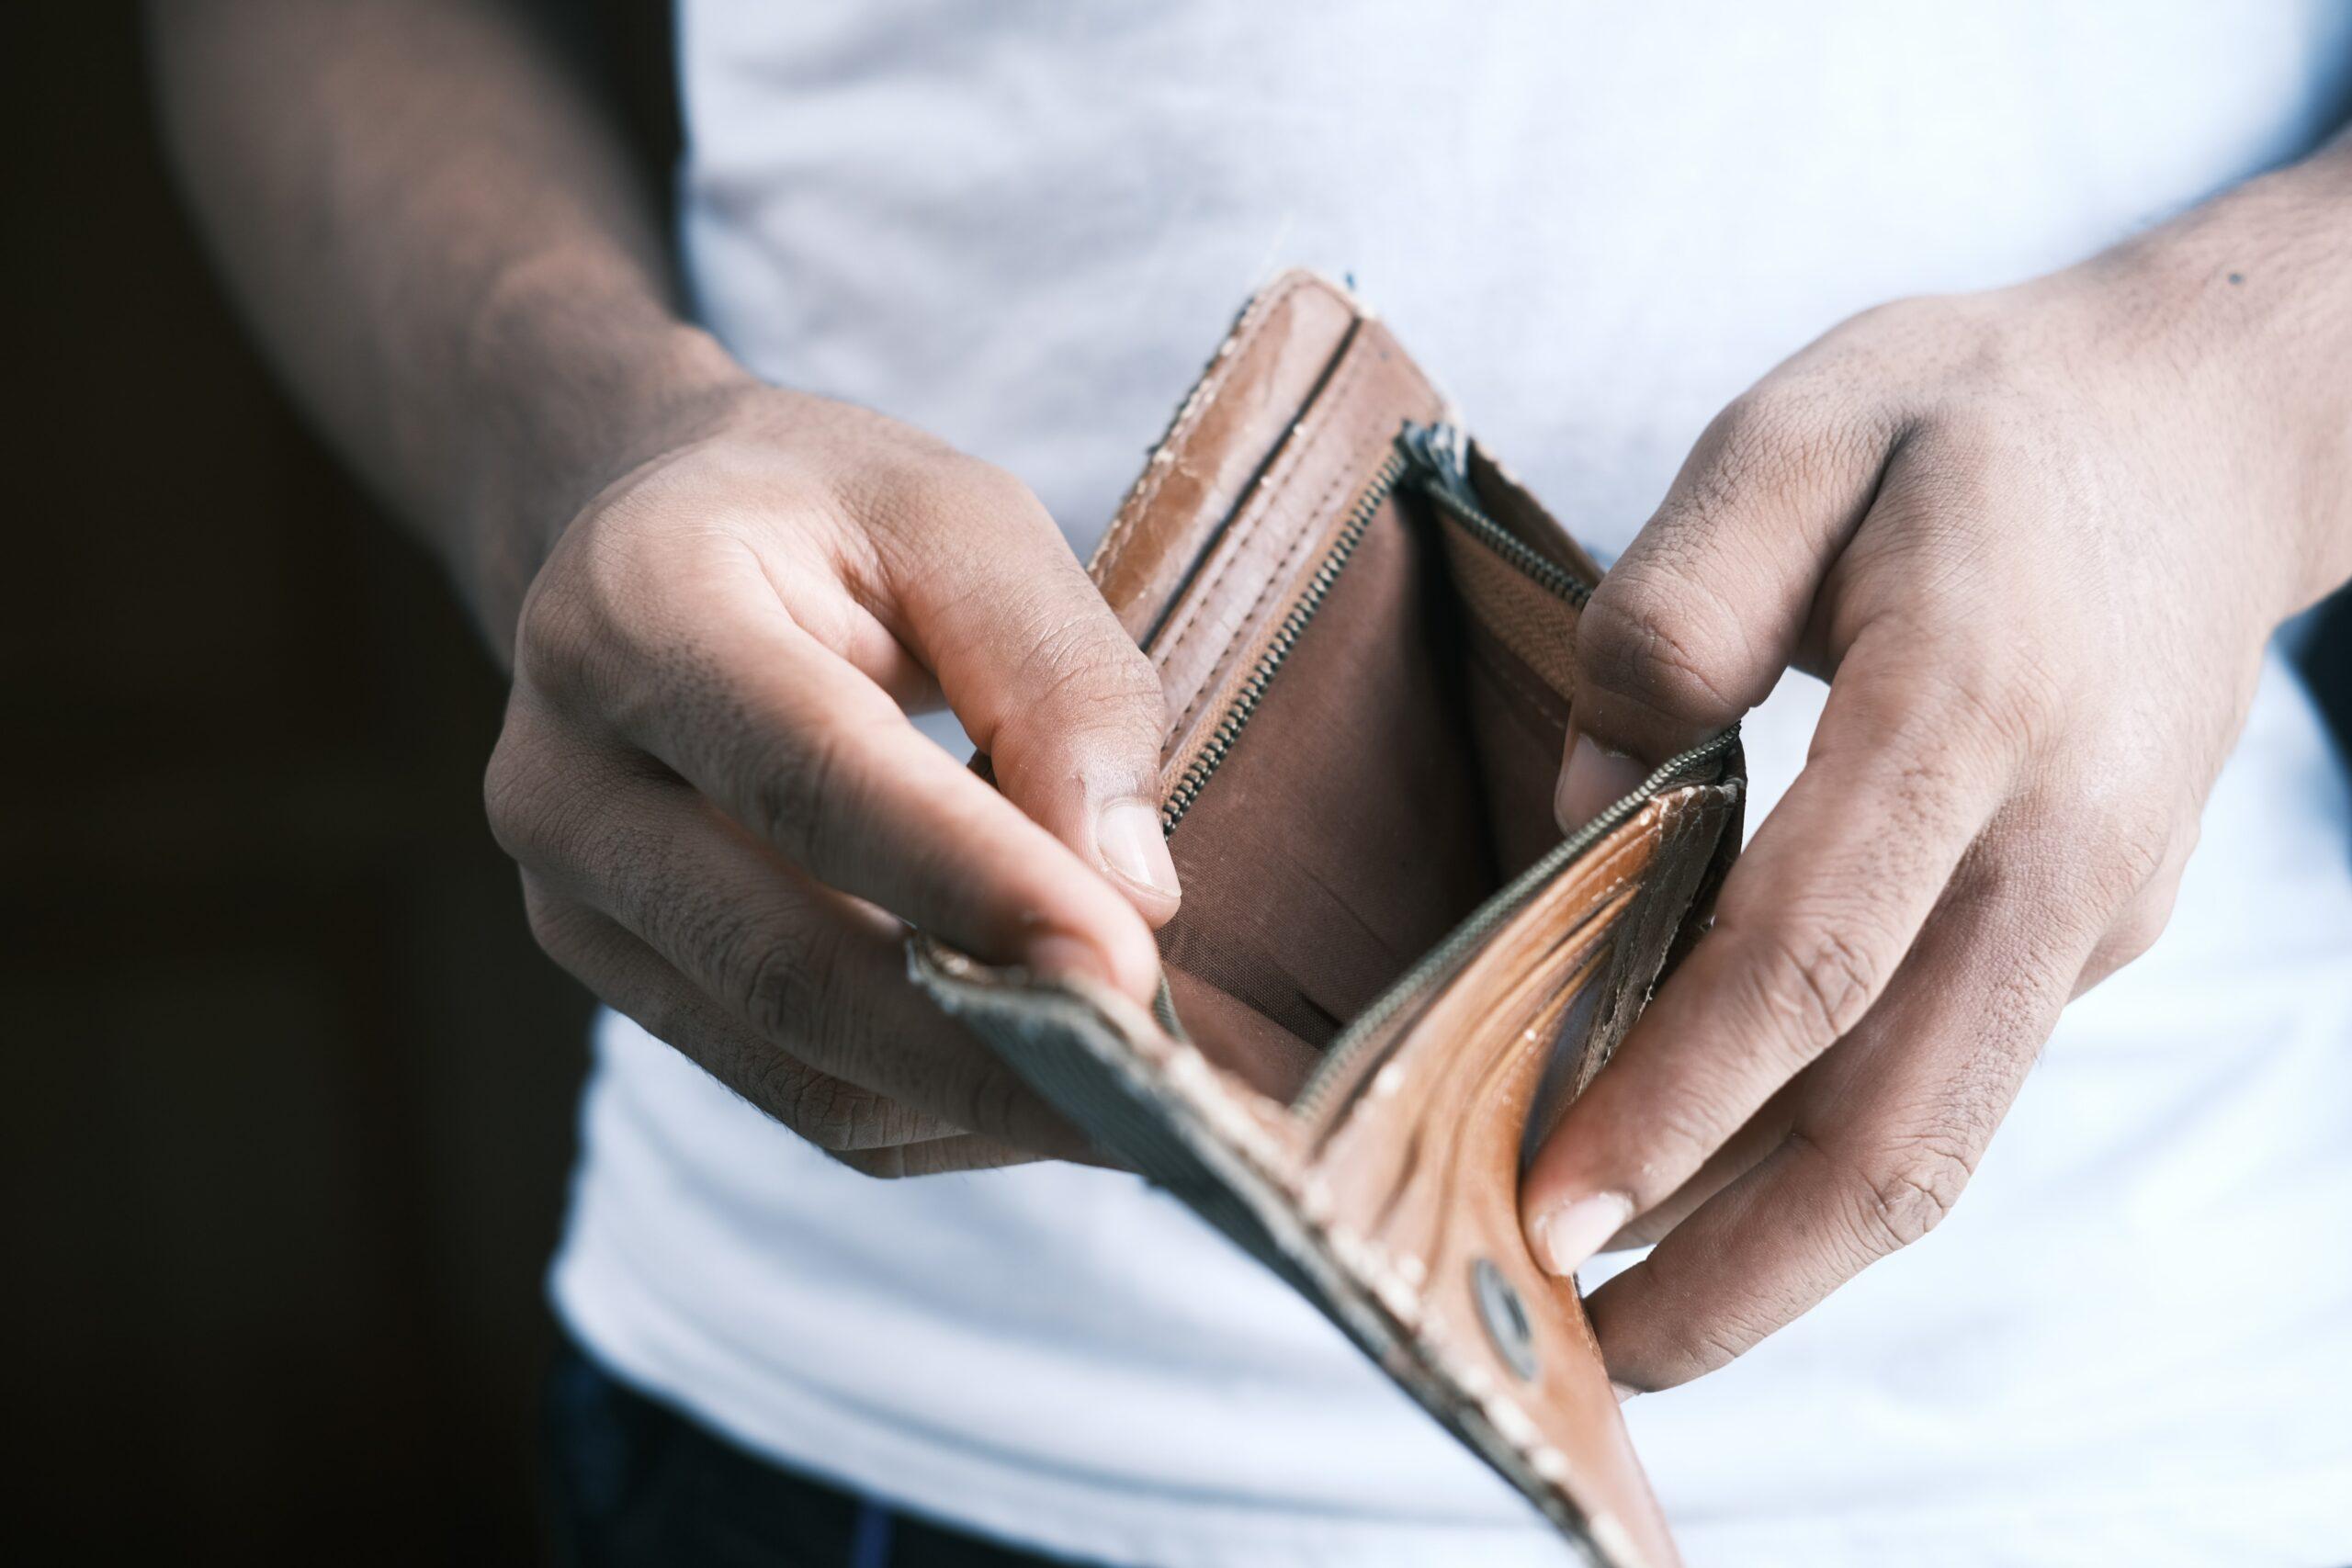 CTBC personal loan online application - loan purposes